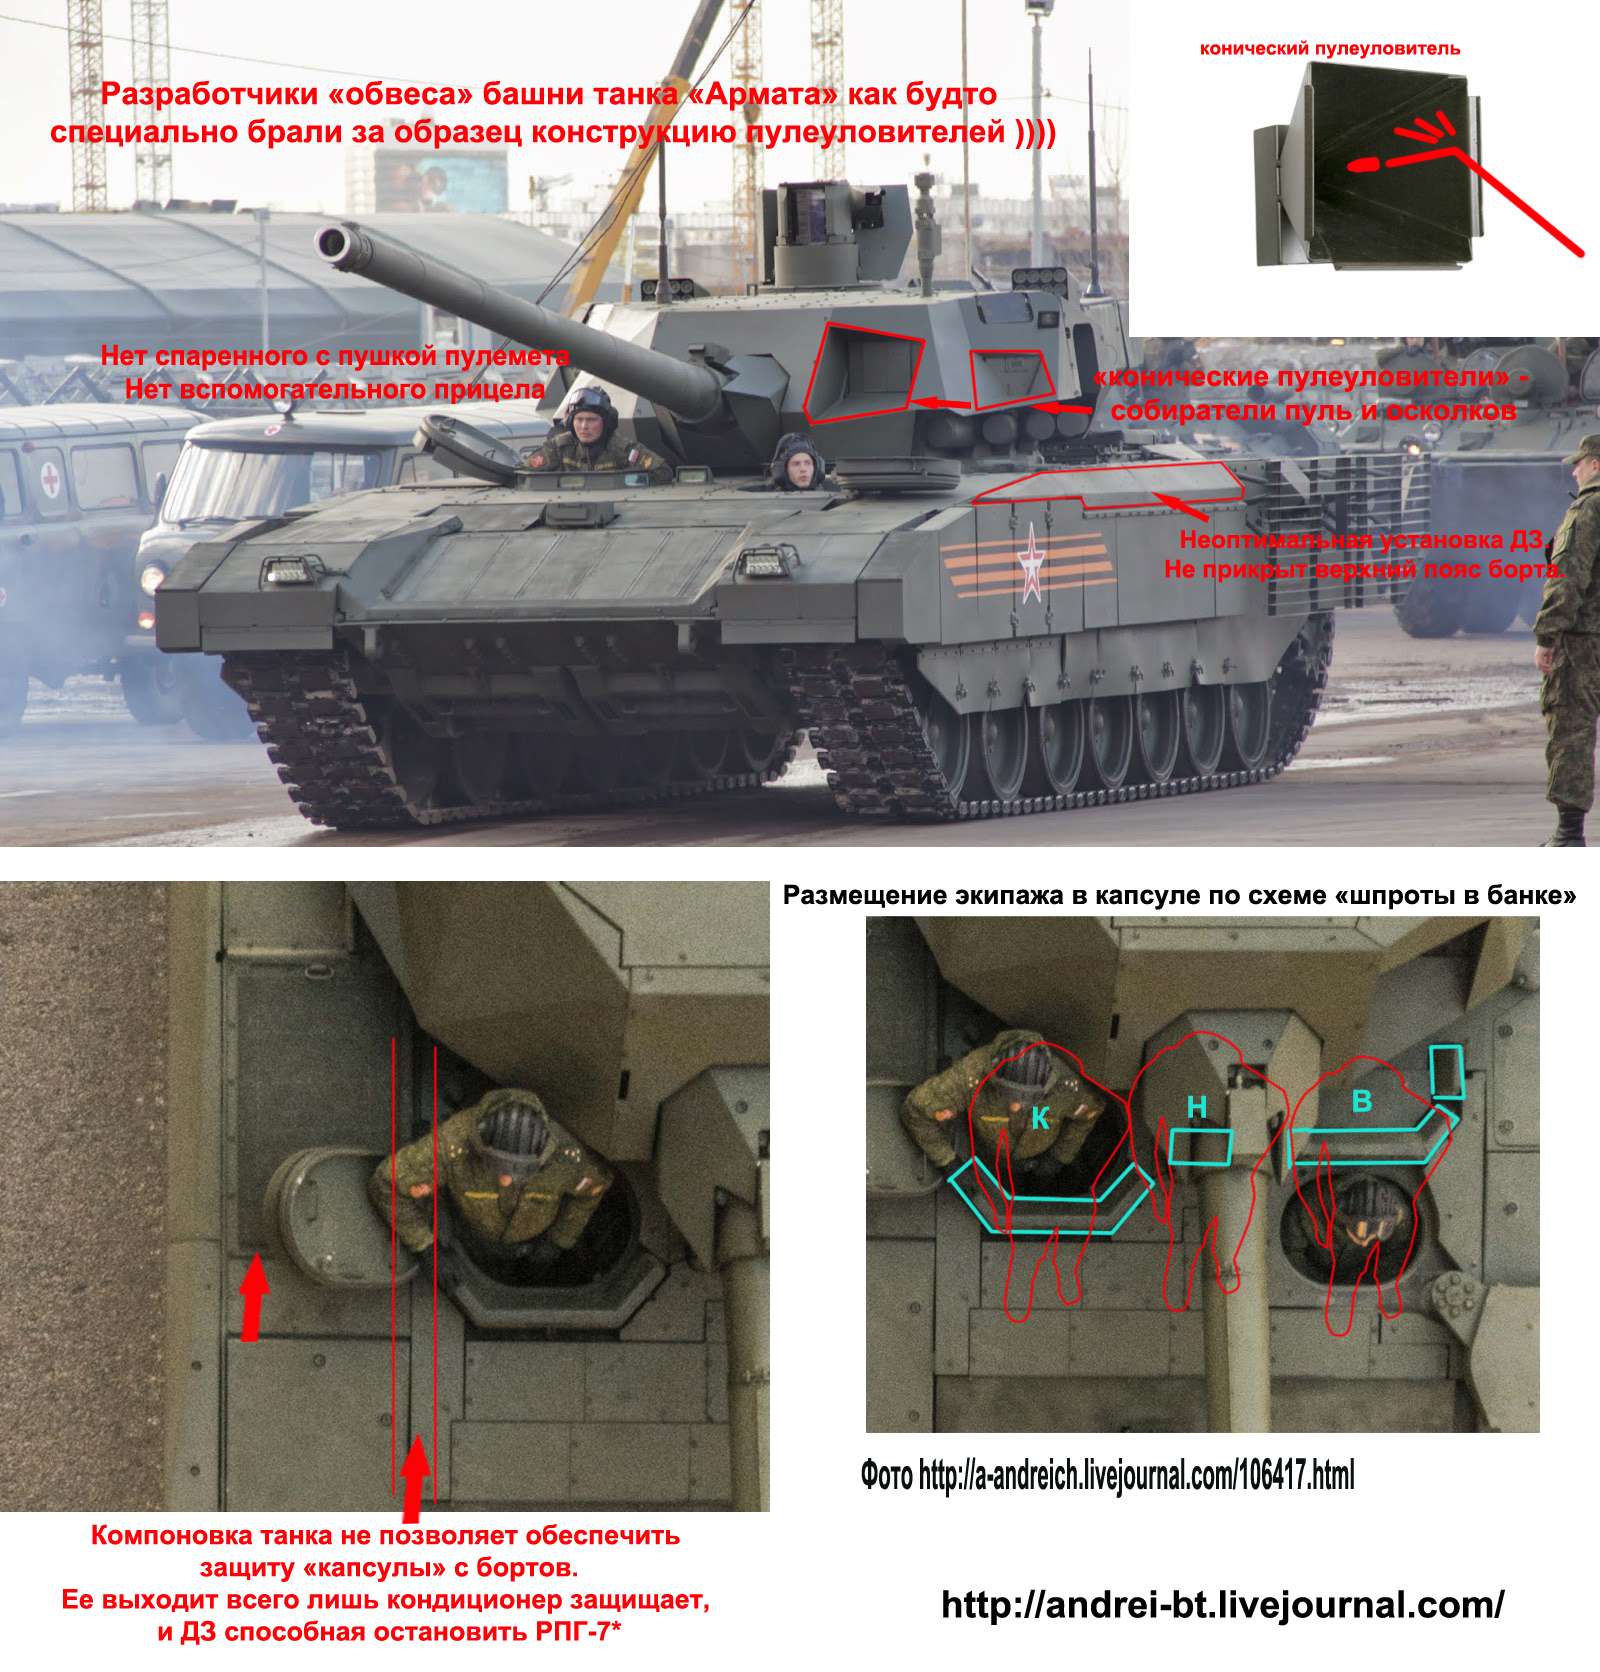 [Official] Armata Discussion thread #2 - Page 31 388039_original